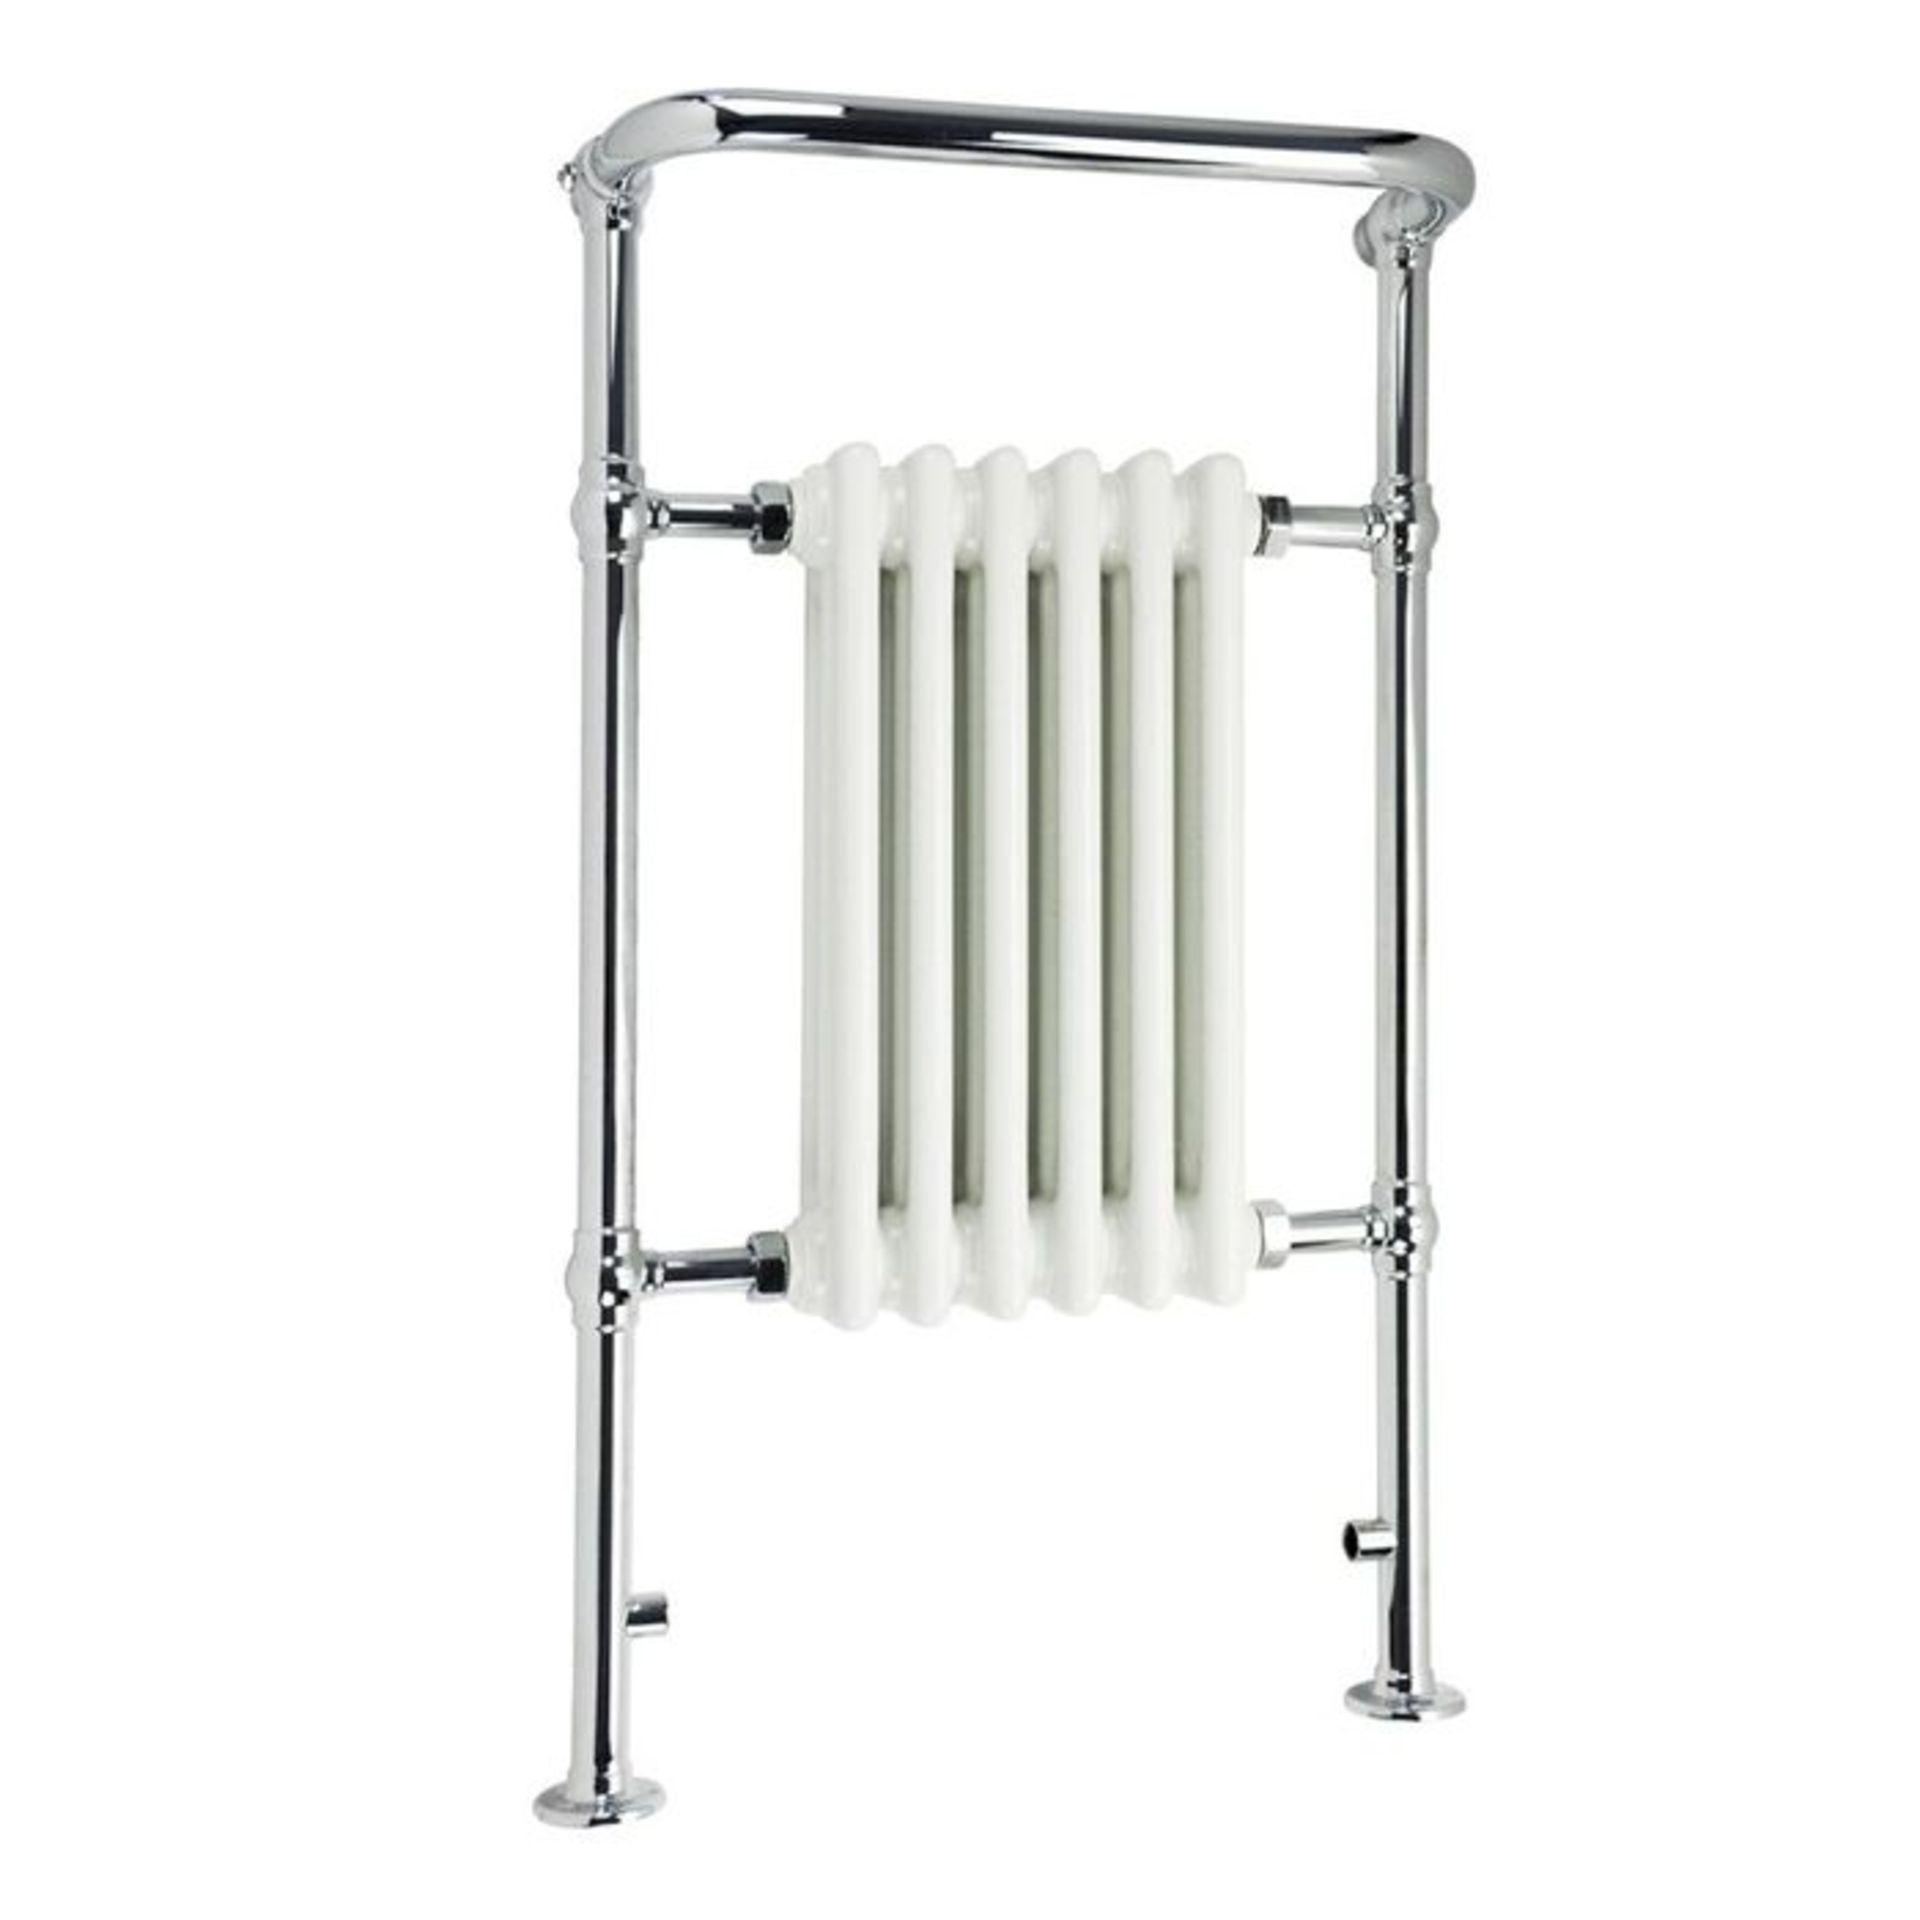 Lot 30 - (XX20) 963x583mm Medium Traditional White Towel Rail Radiator - Cambridge. RRP £431.99. Made f...